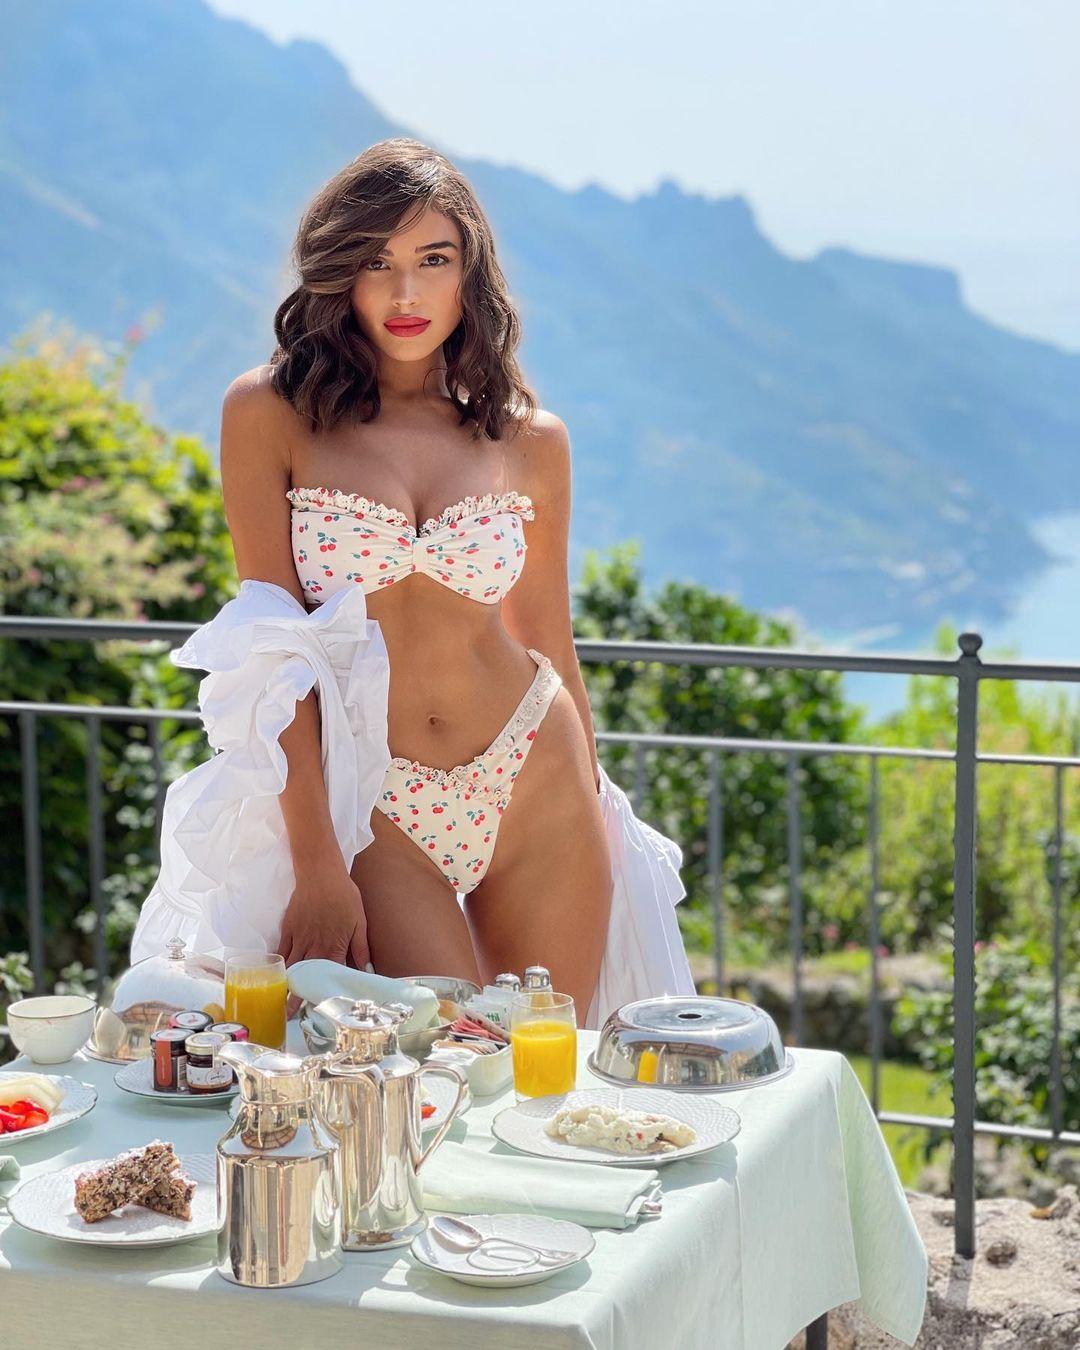 Olivia Culpo's Breakfast of Champions!.jpg